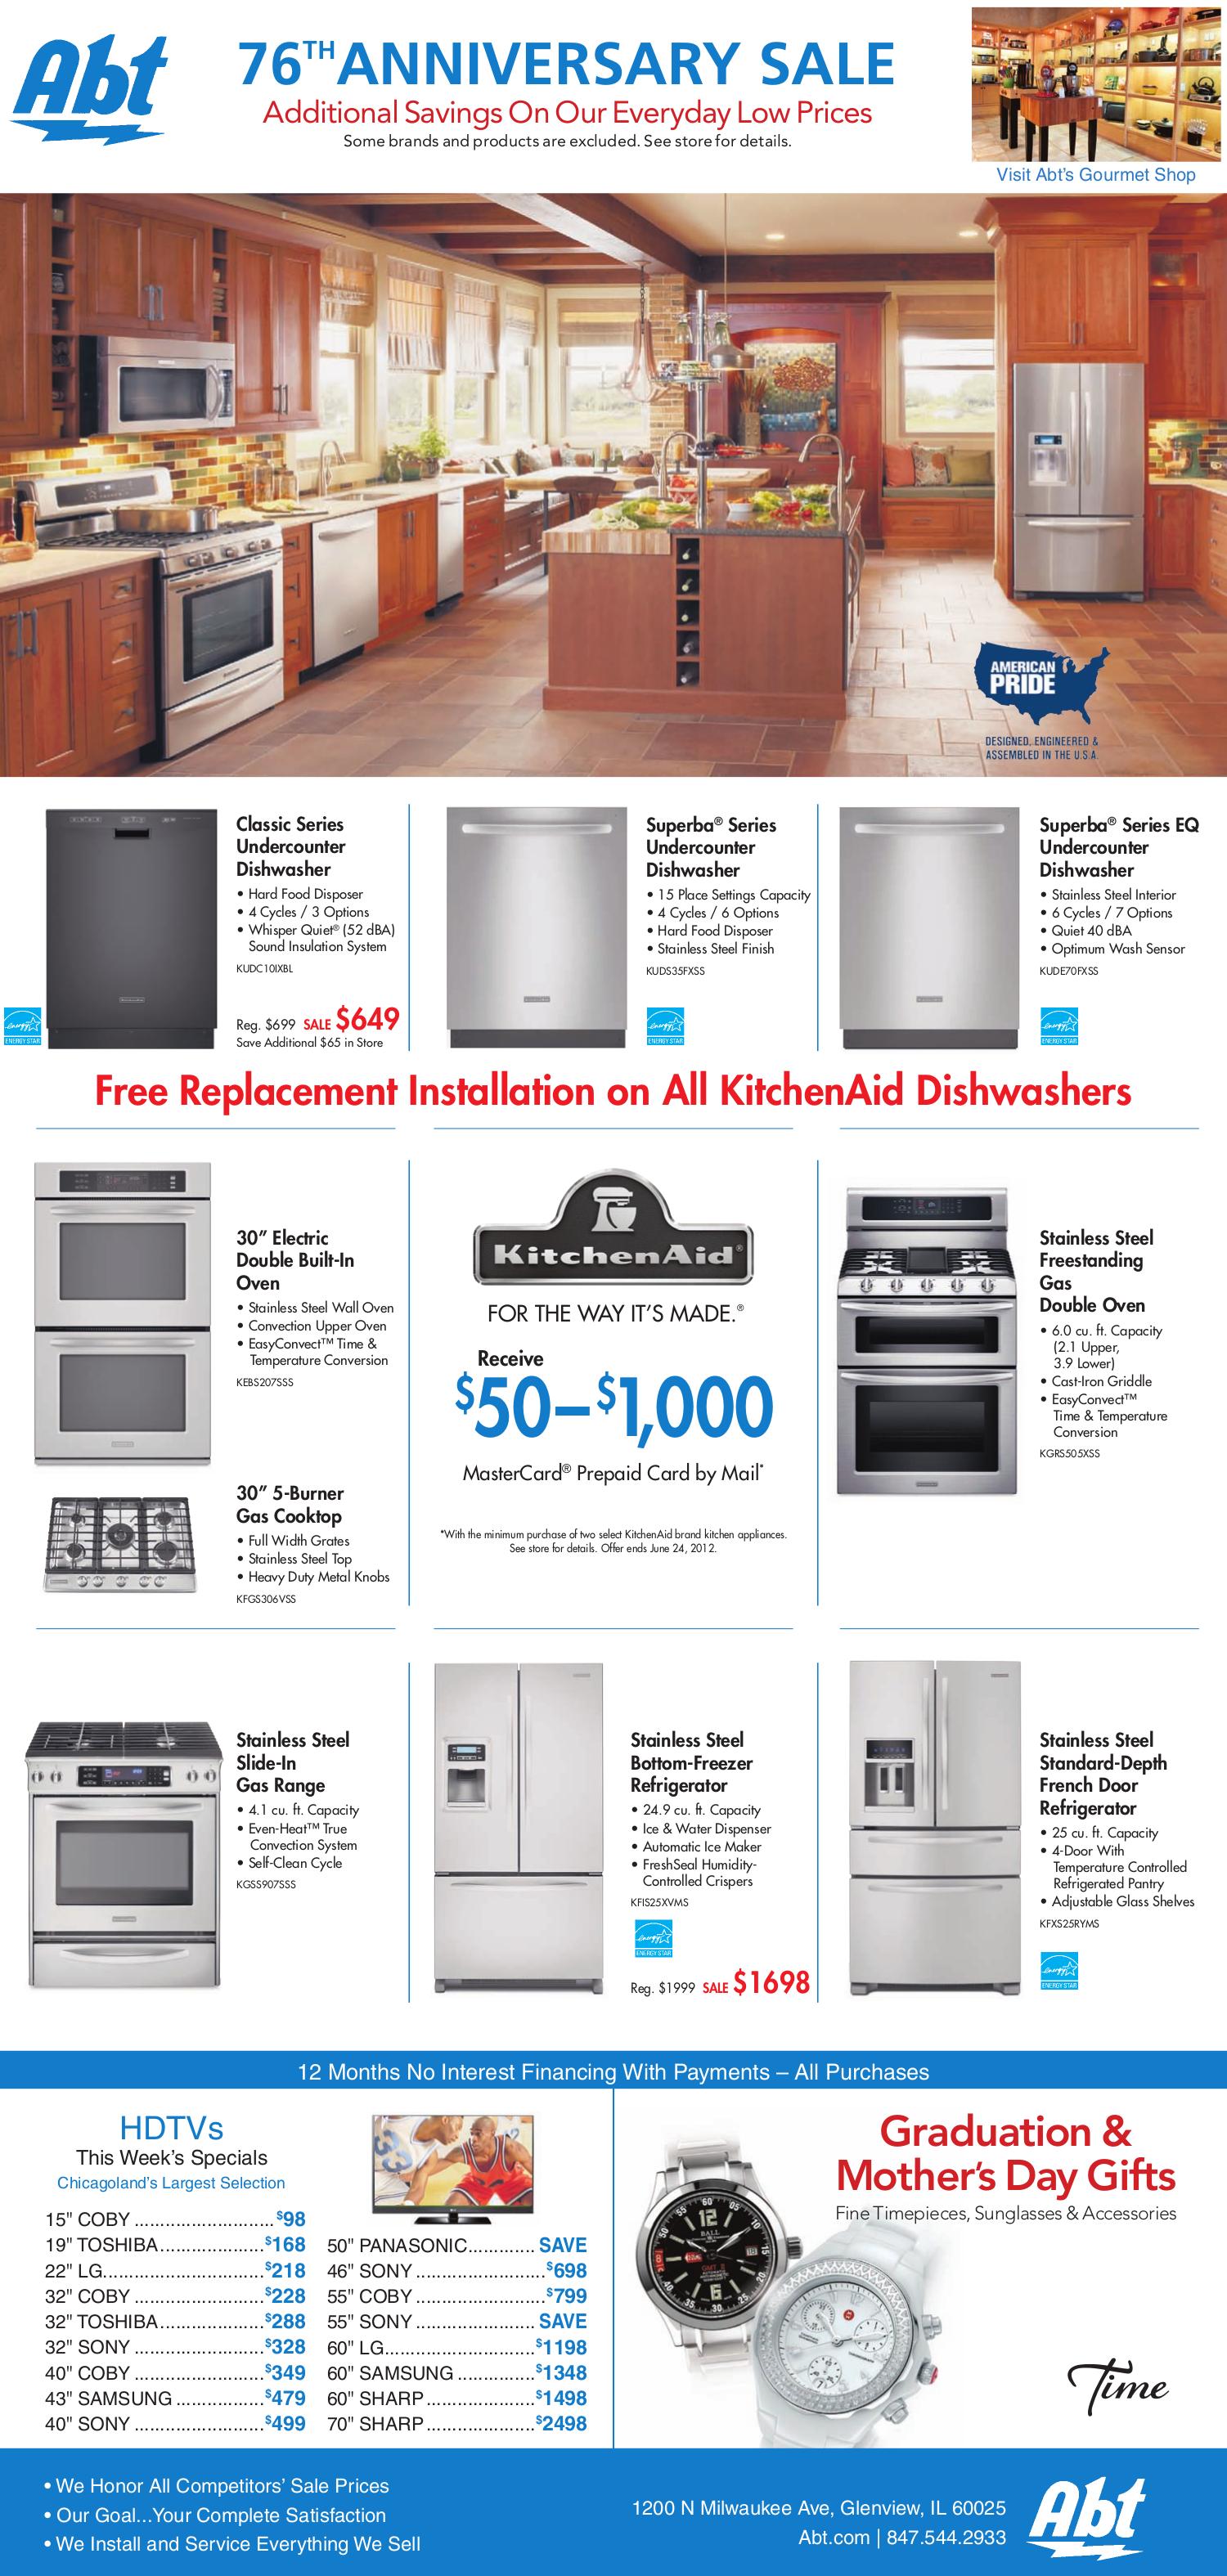 Kitchenaid Dishwasher Kuds35fxss Manual Full Version Free